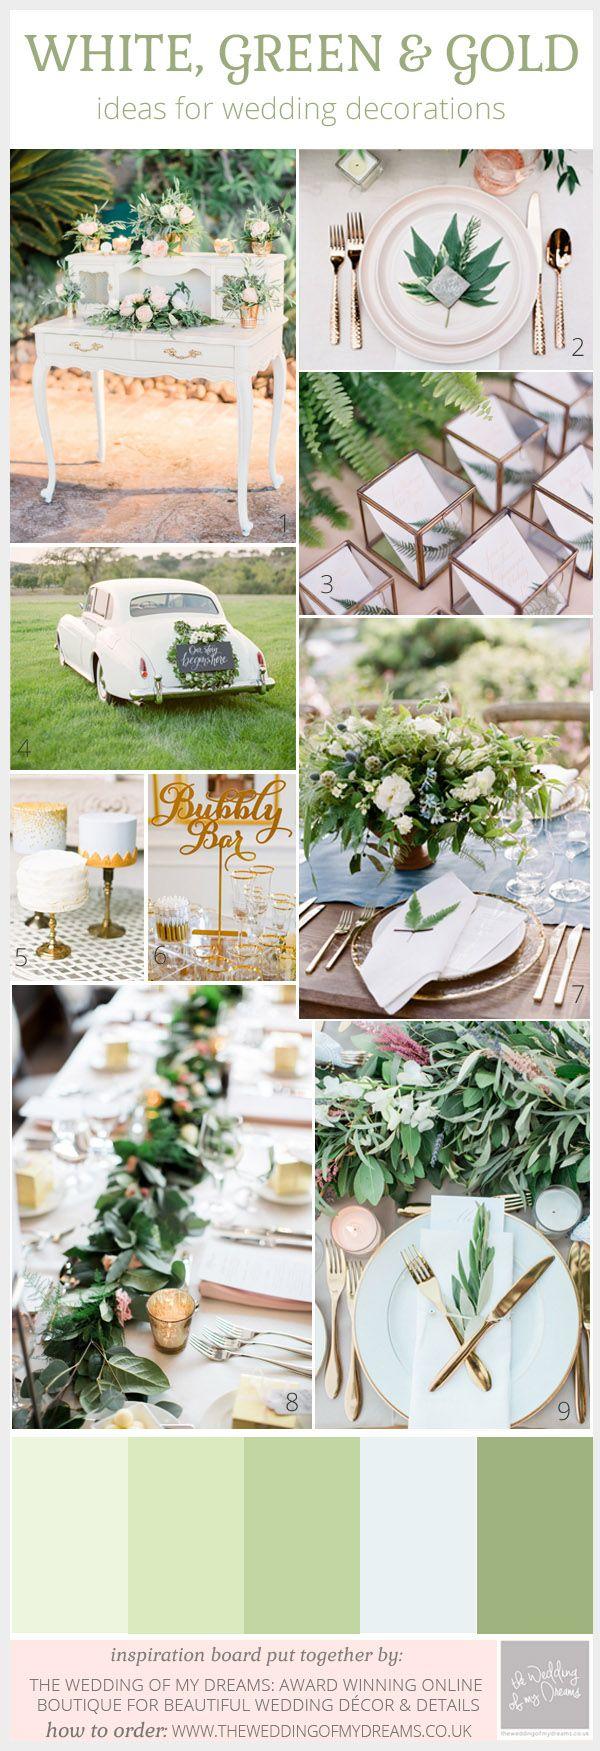 Perfect Reflection Of My Favourite Colour Scheme Green White And Gold Wedding Ideas Inspiration Weddingofmydreams Weddingomd